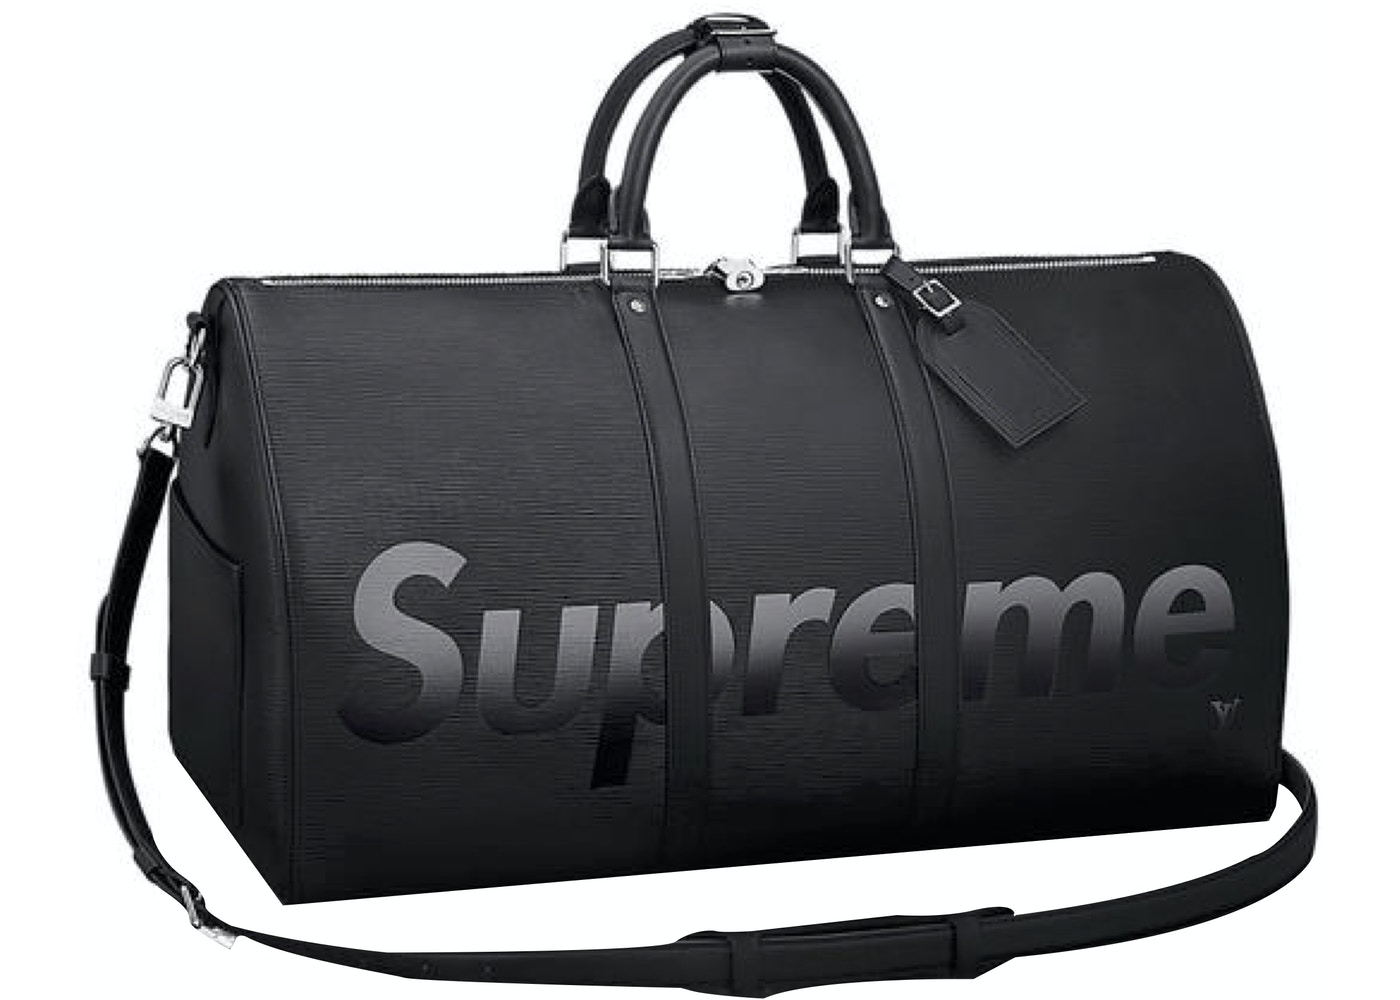 69a5916d625 Louis Vuitton x Supreme Keepall Bandouliere Epi 55 Black